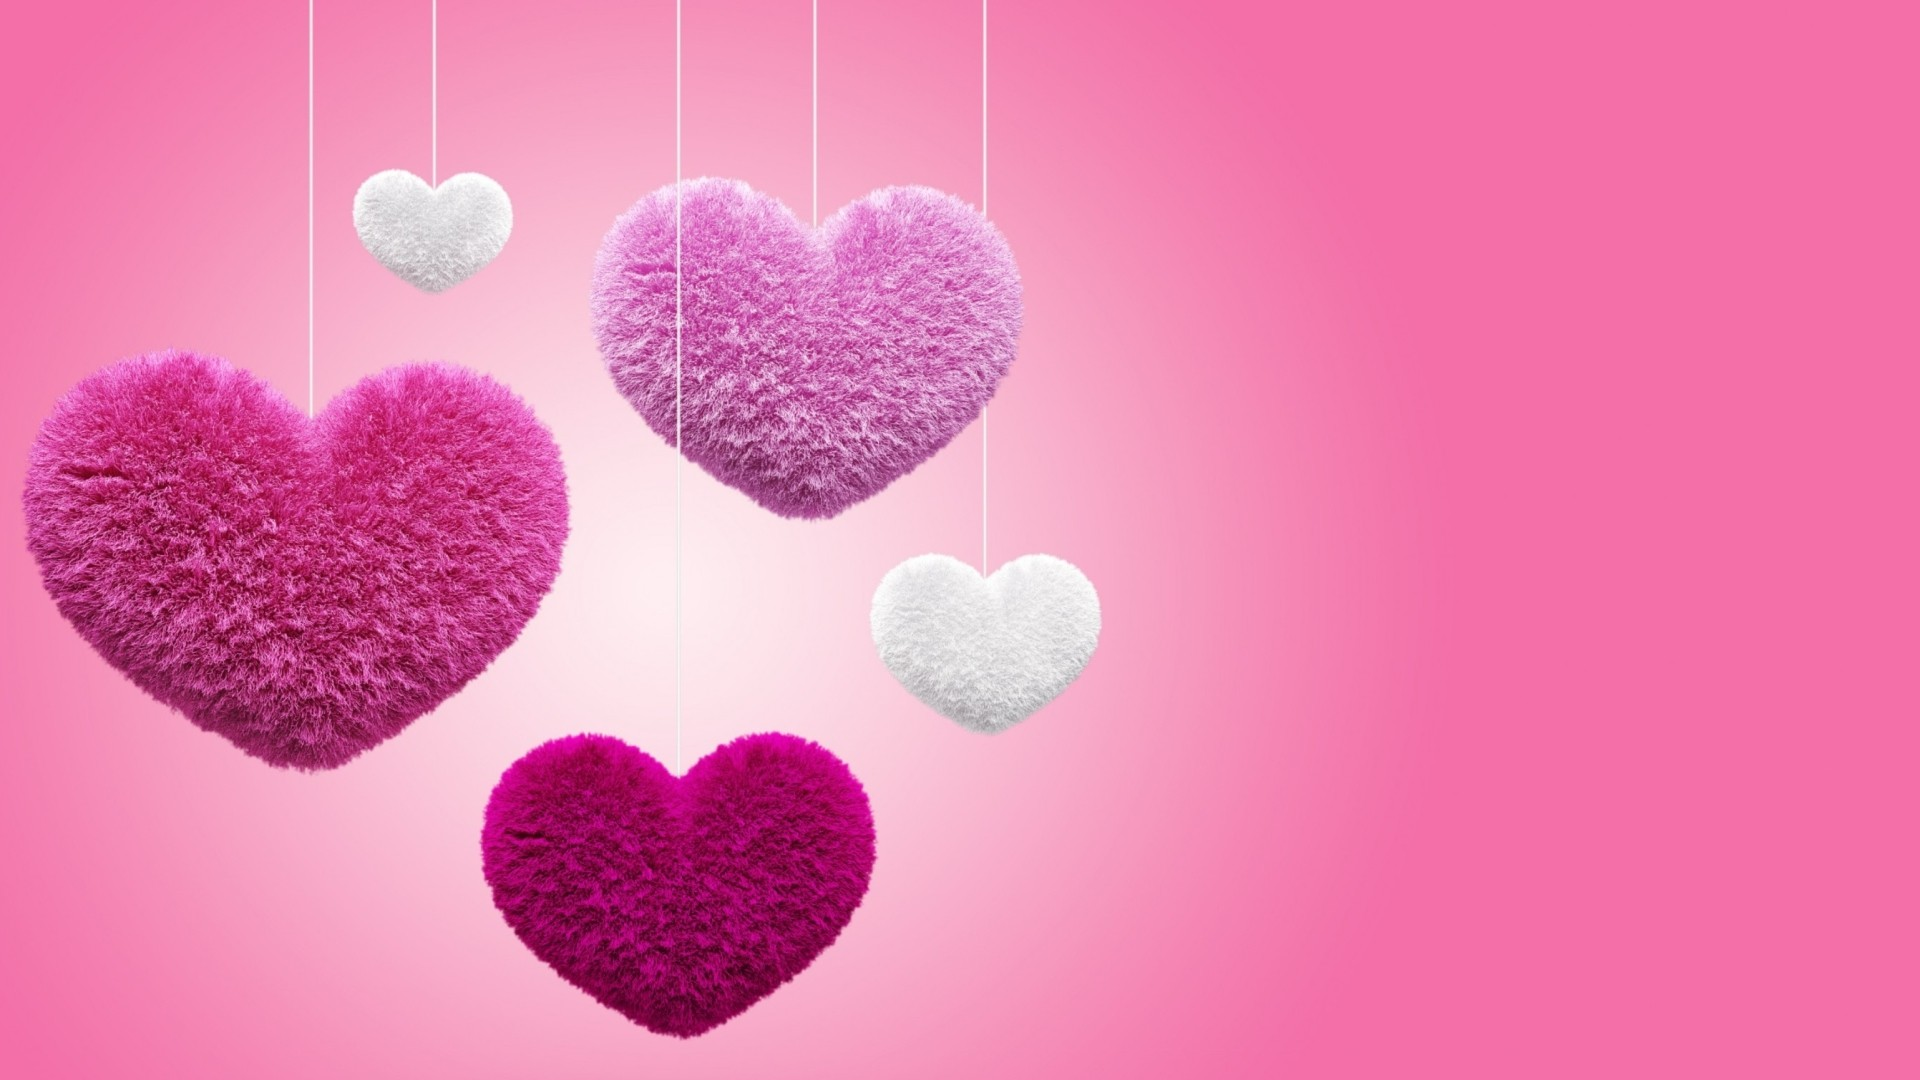 Pink Heart hd wallpaper download